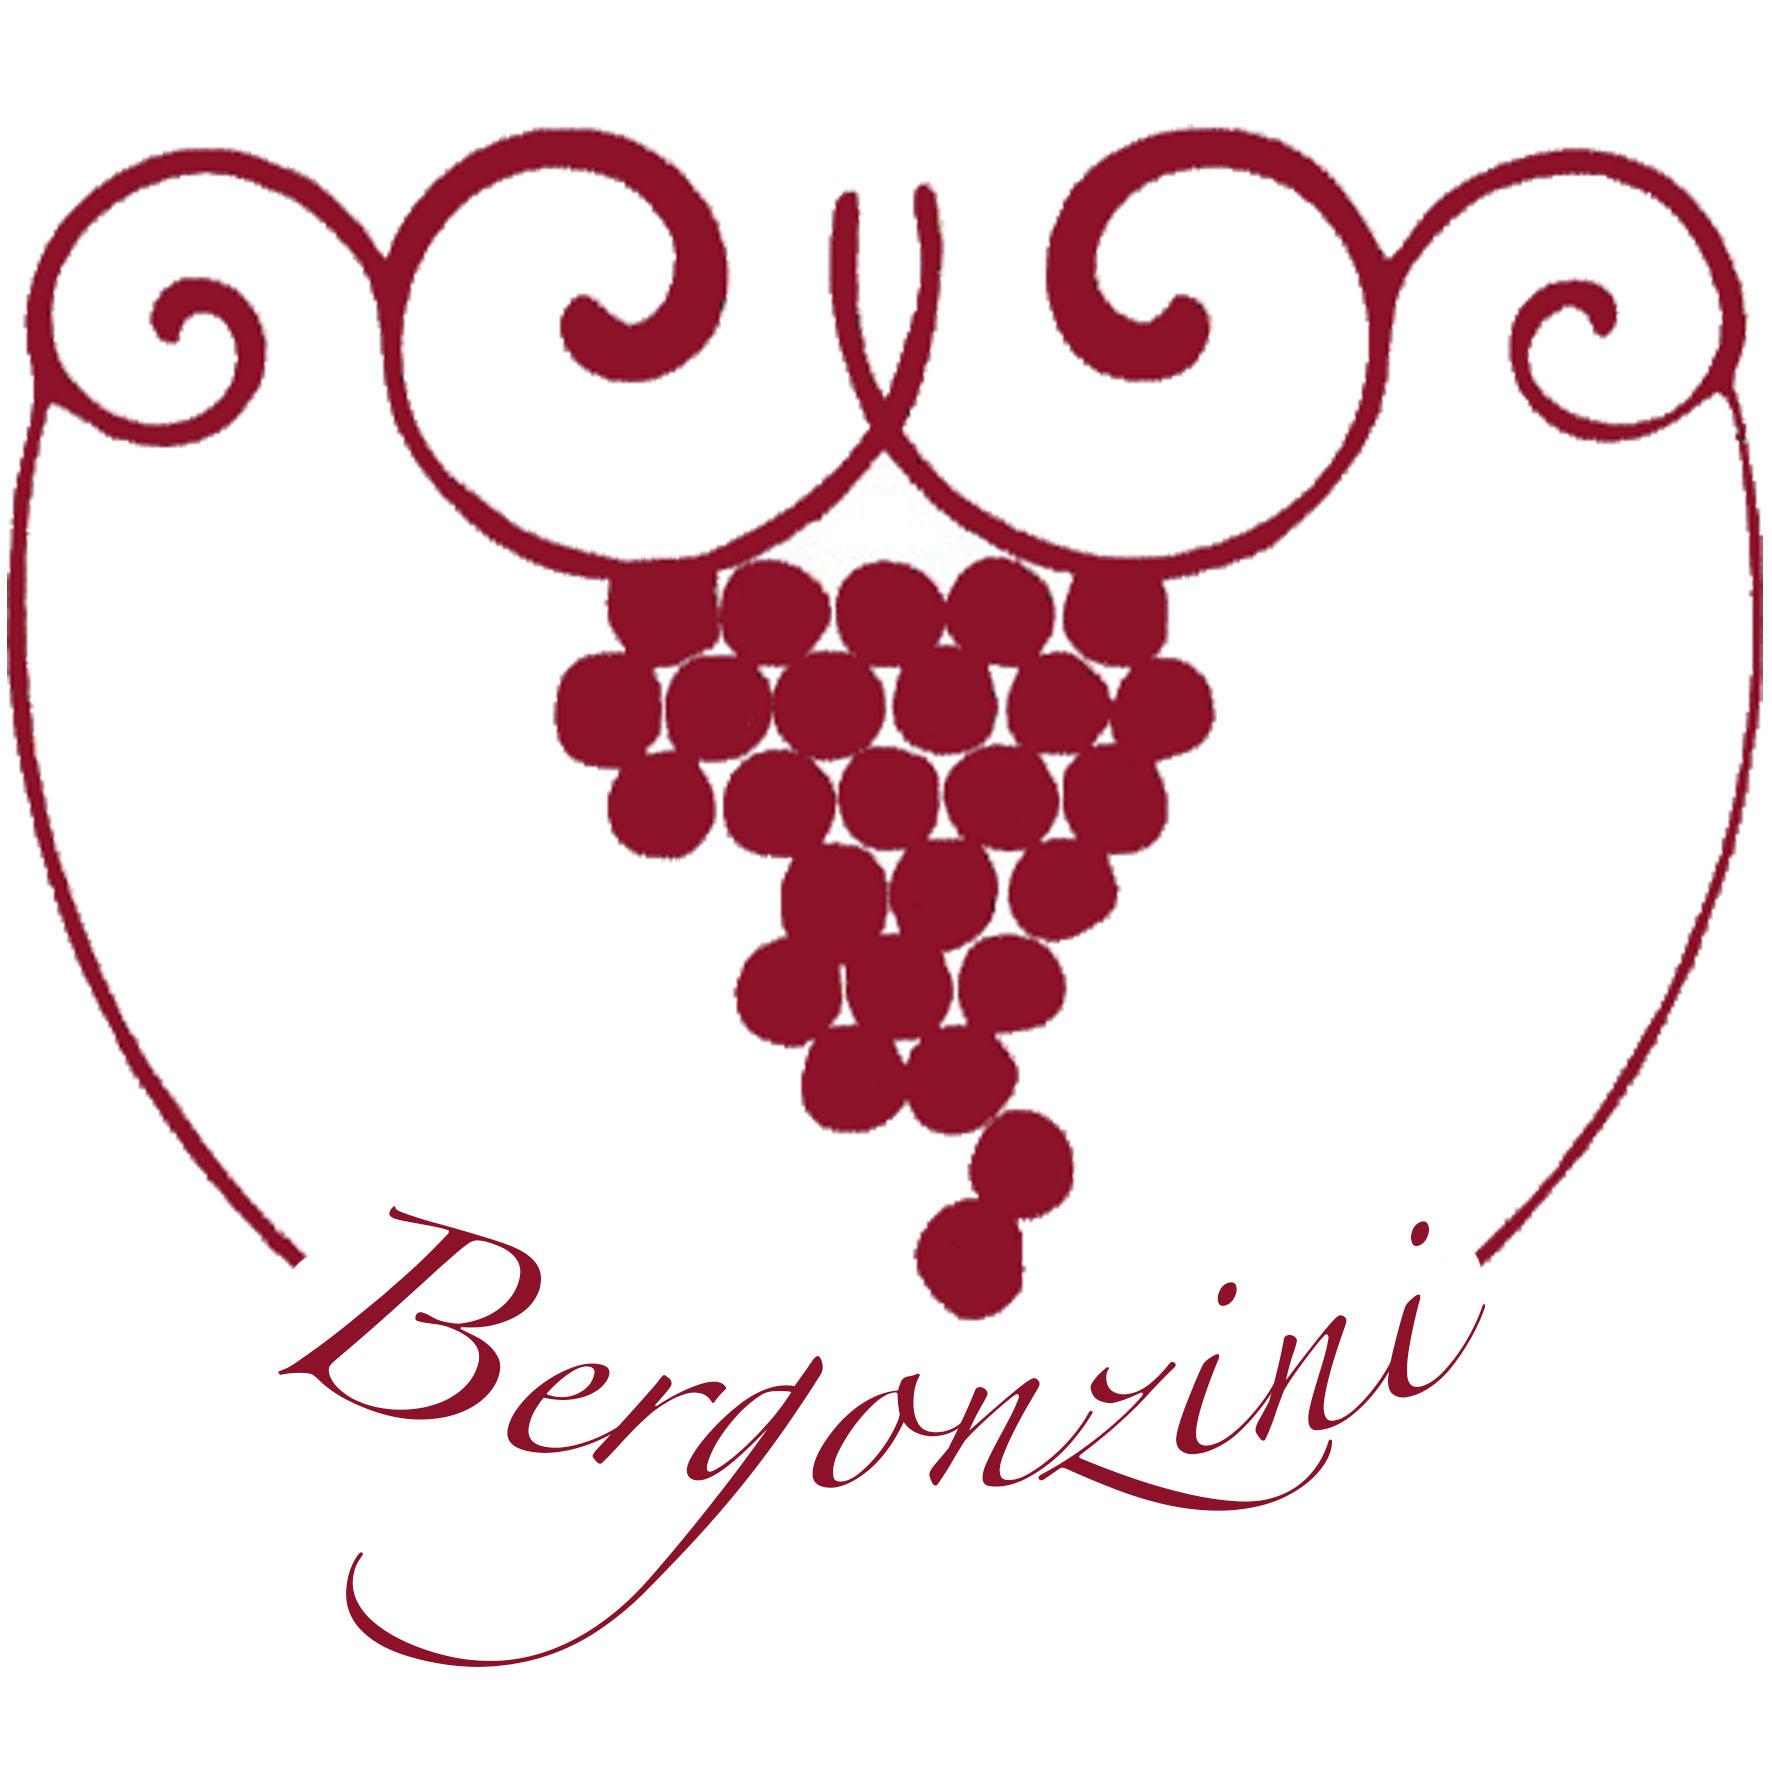 Bergonzini Società Agricola Logo